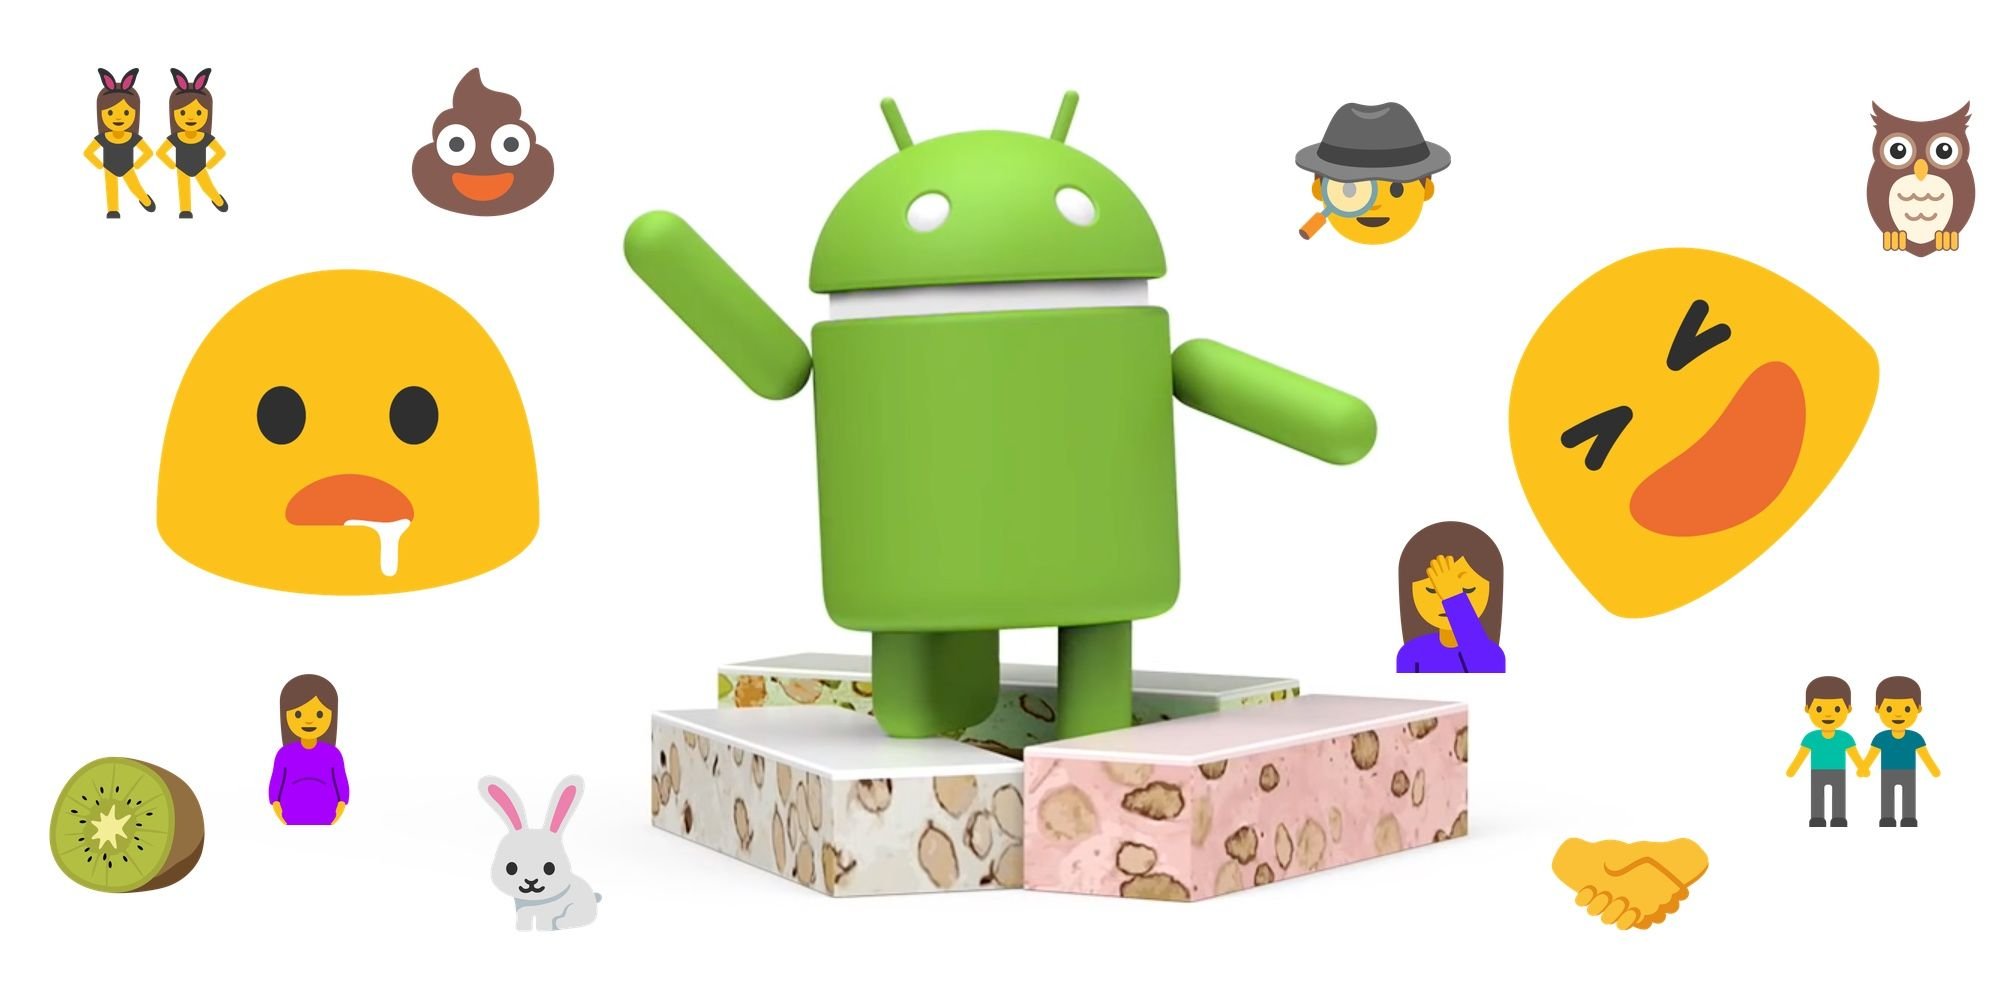 Android 7.0 Nougat Emoji Changelog